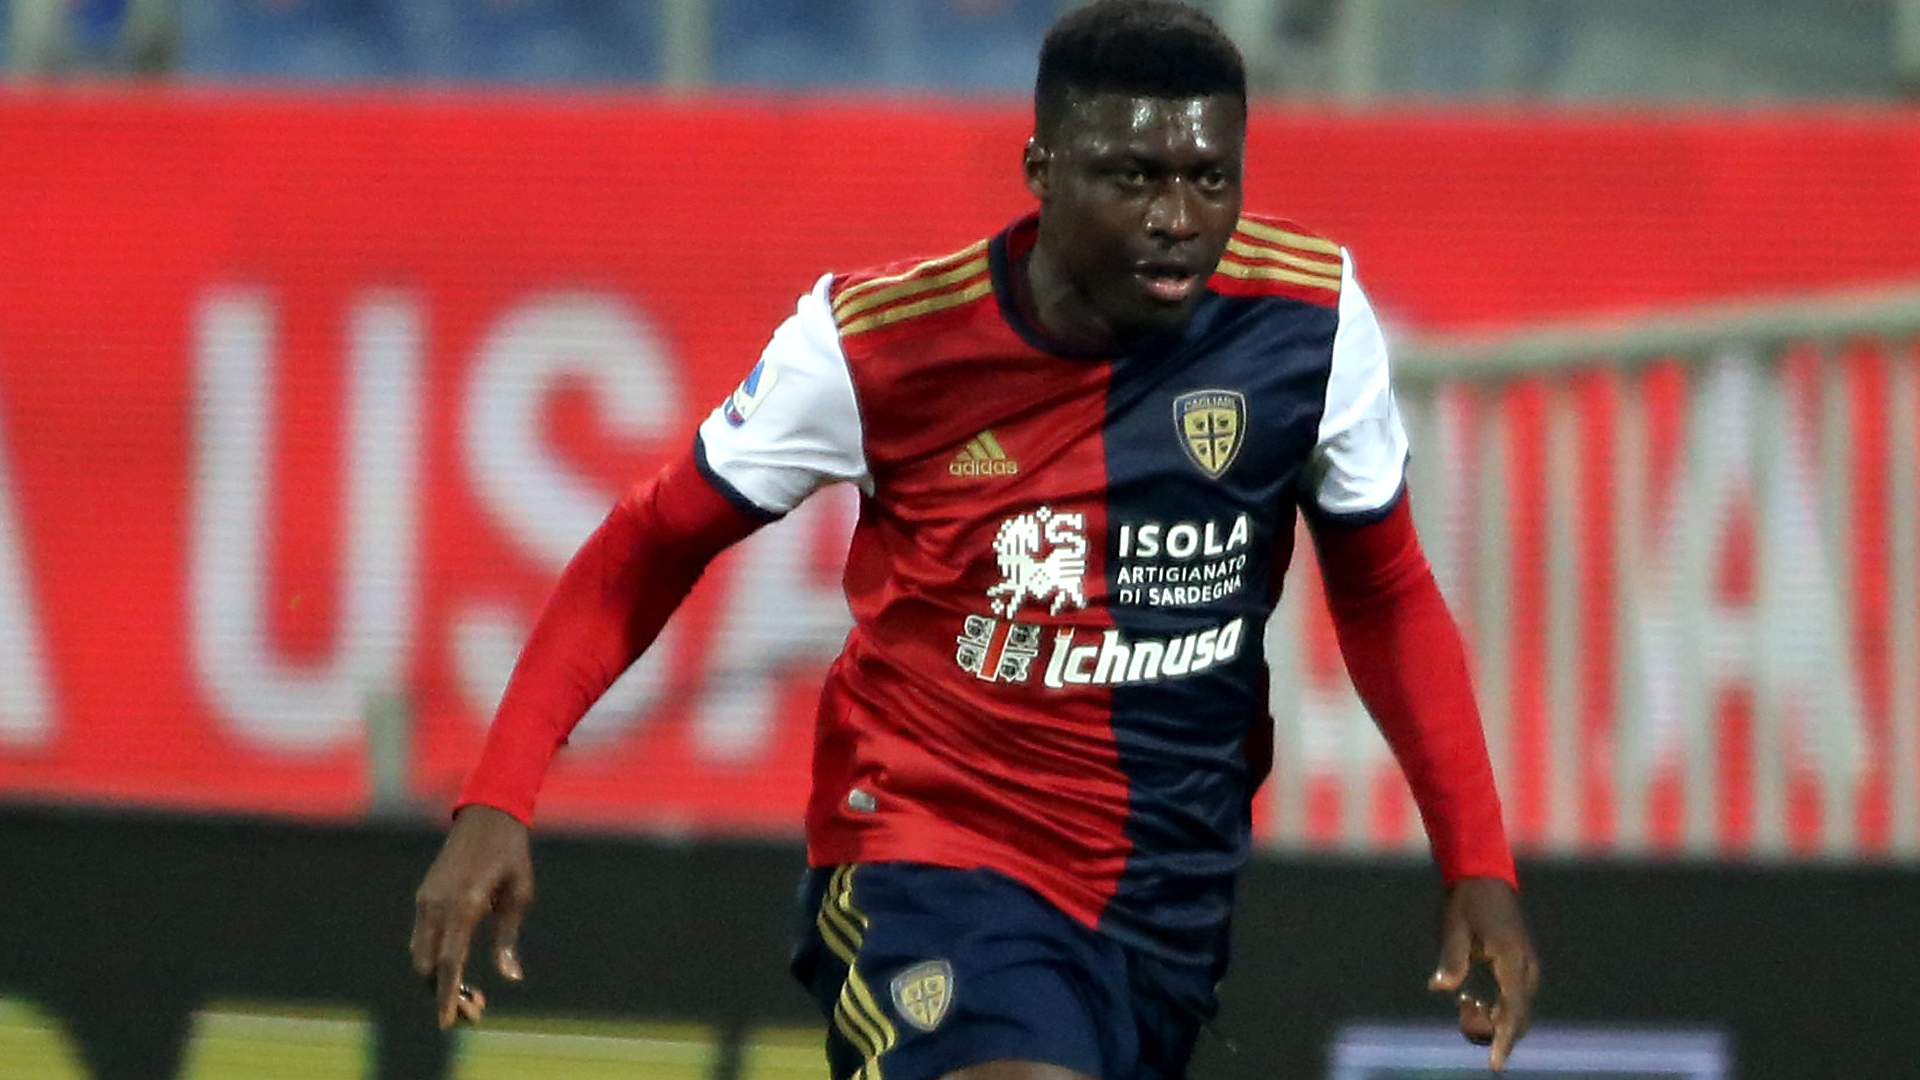 Ghana duo Alfred Duncan and Kwadwo Asamoah help Cagliari record vital win against Bologna